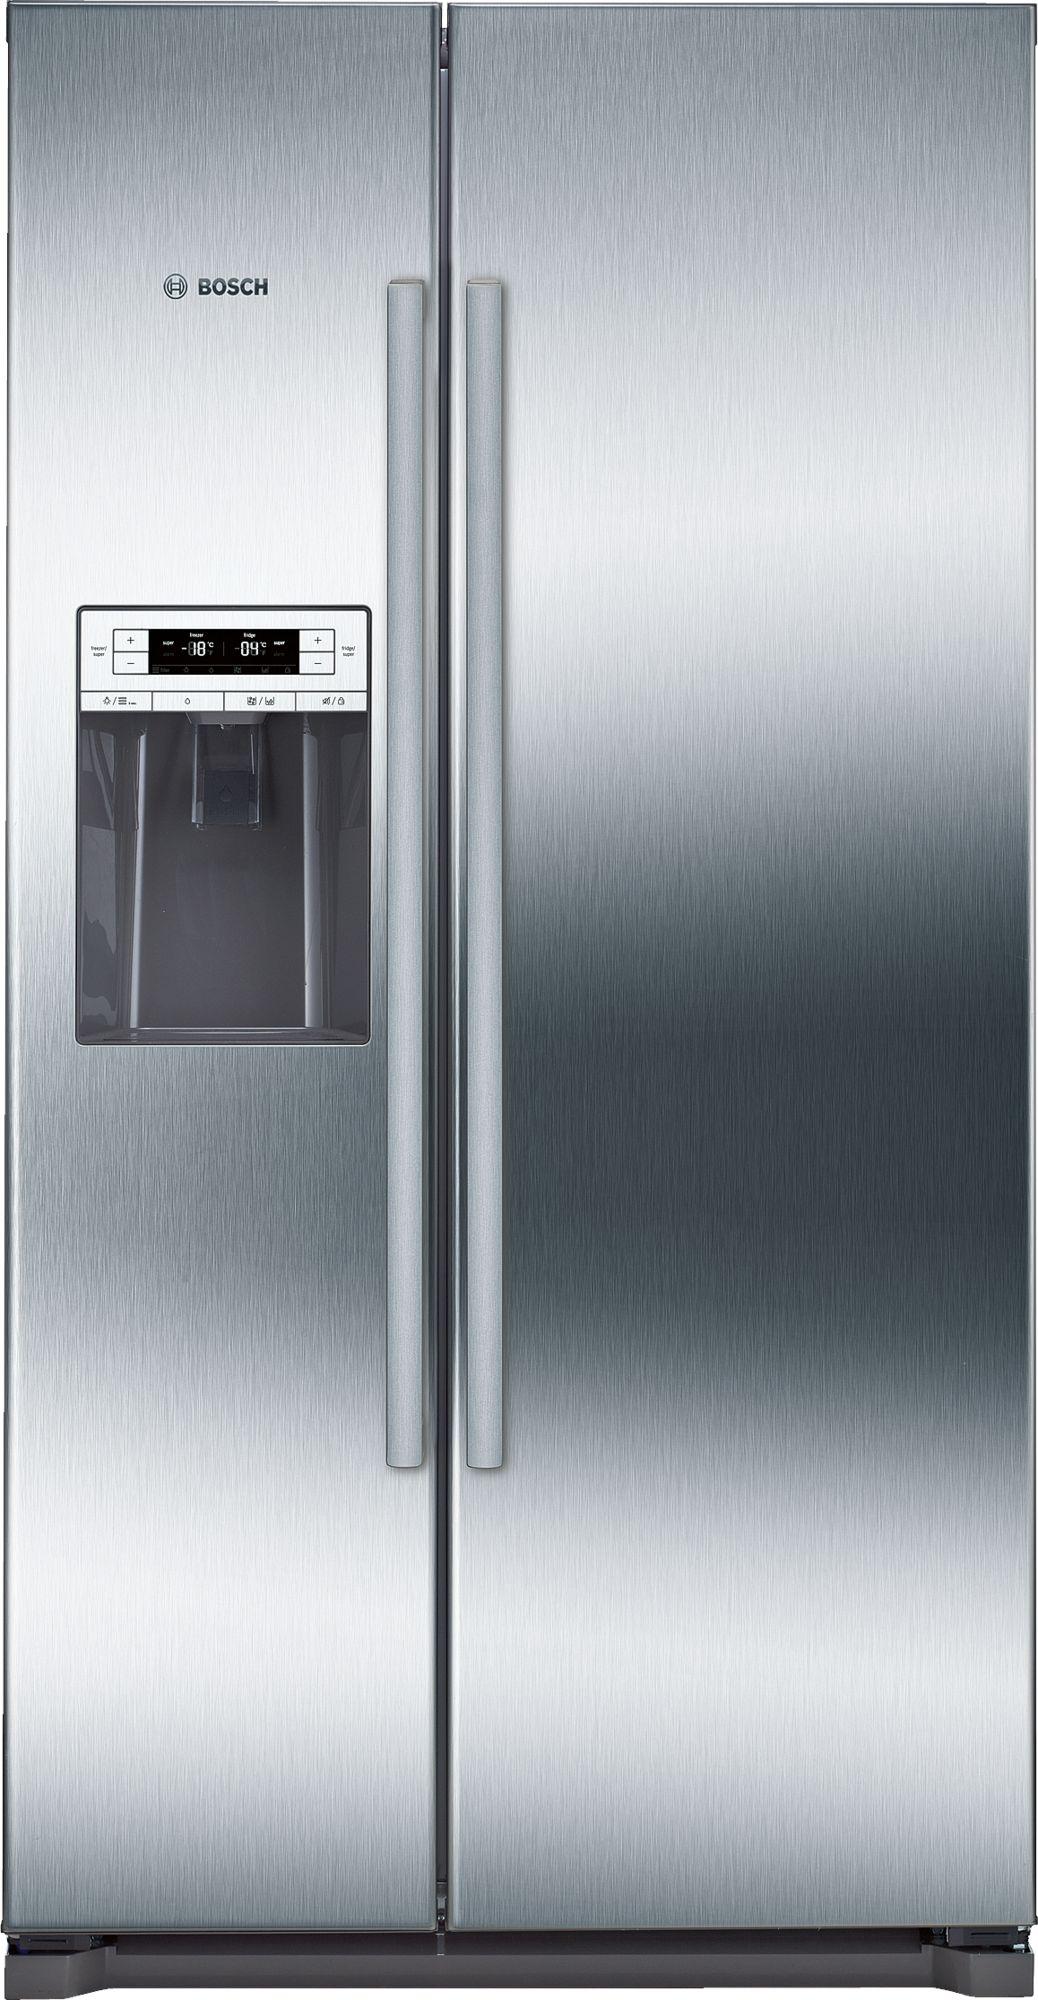 BOSCH ตู้เย็น รุ่น KAI90VI20J